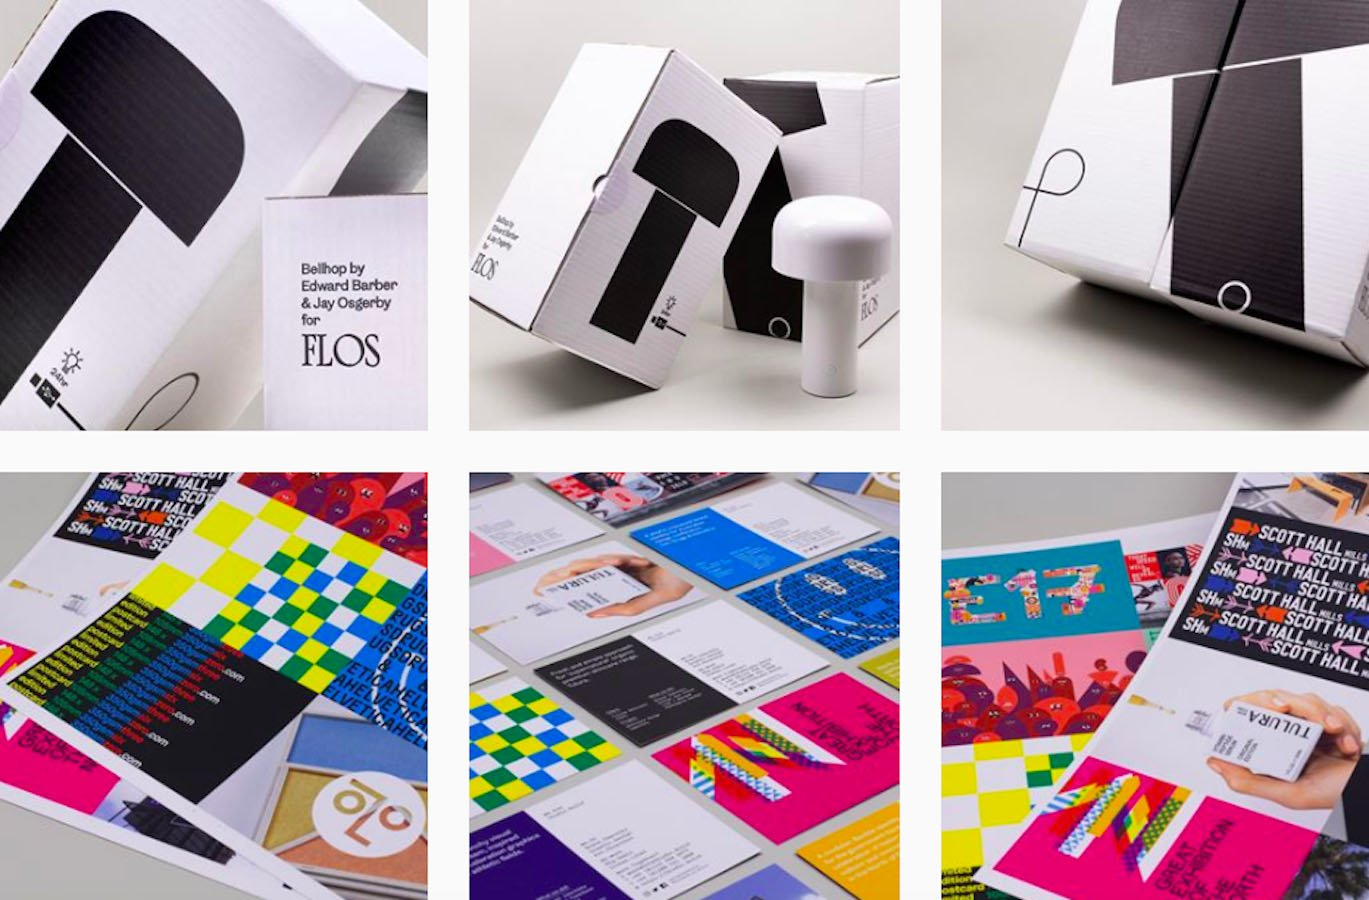 Web Design Inspiration: 110+ Accounts On Instagram and 10+ Best UX & Web Design Books in 2020 - studiodotbuild